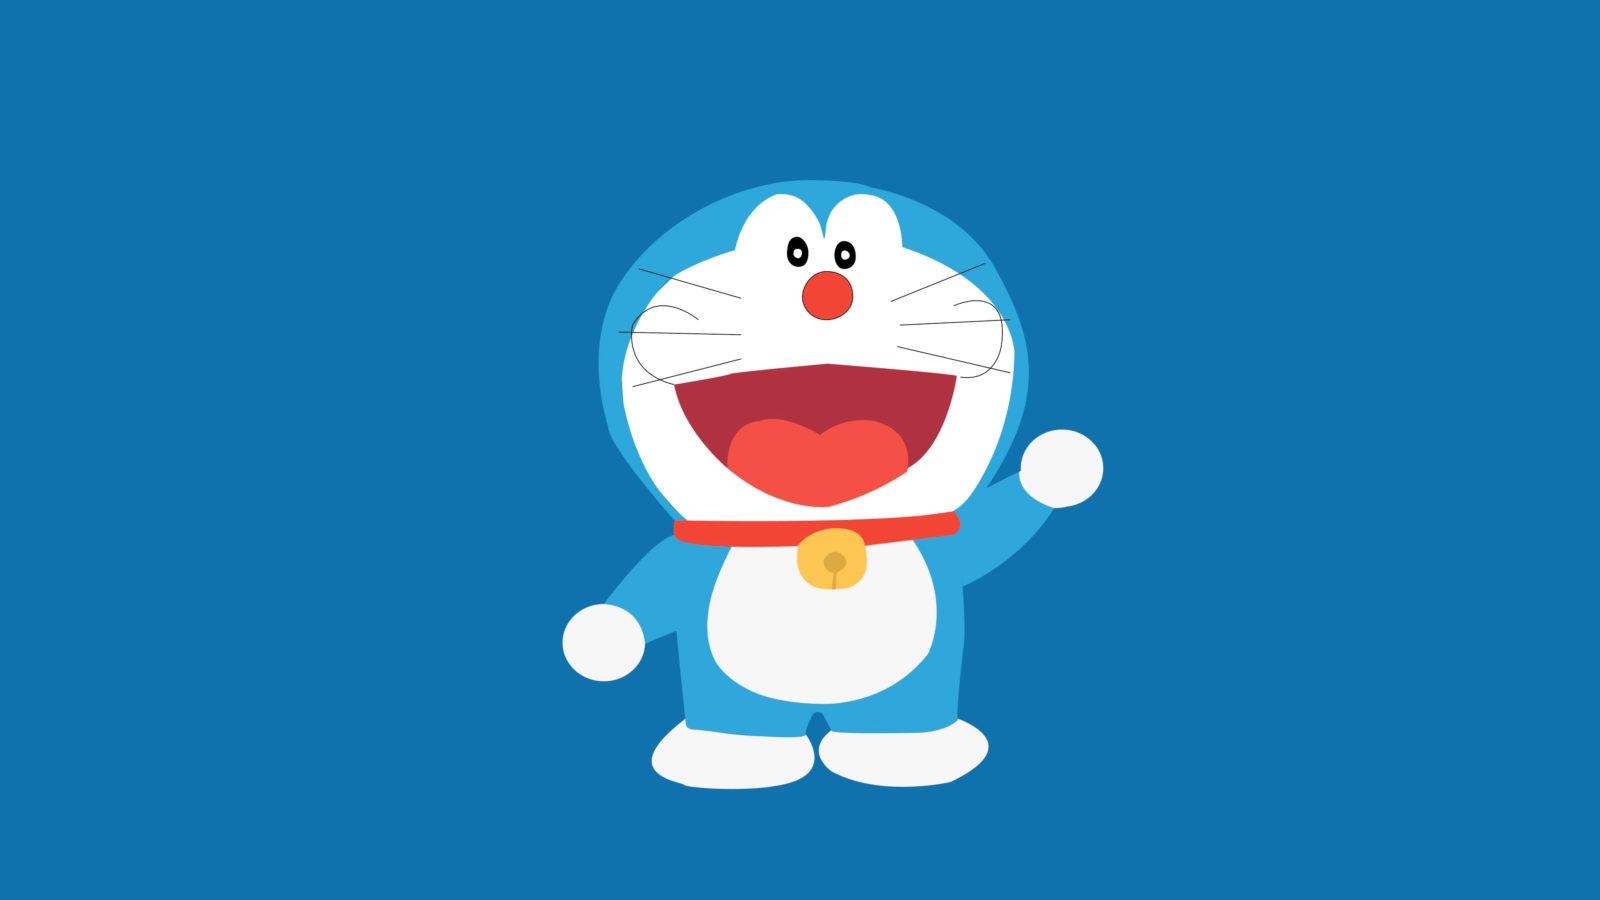 Koleksi Gambar Doraemon Paling Lucu Imut Dan Menggemaskan